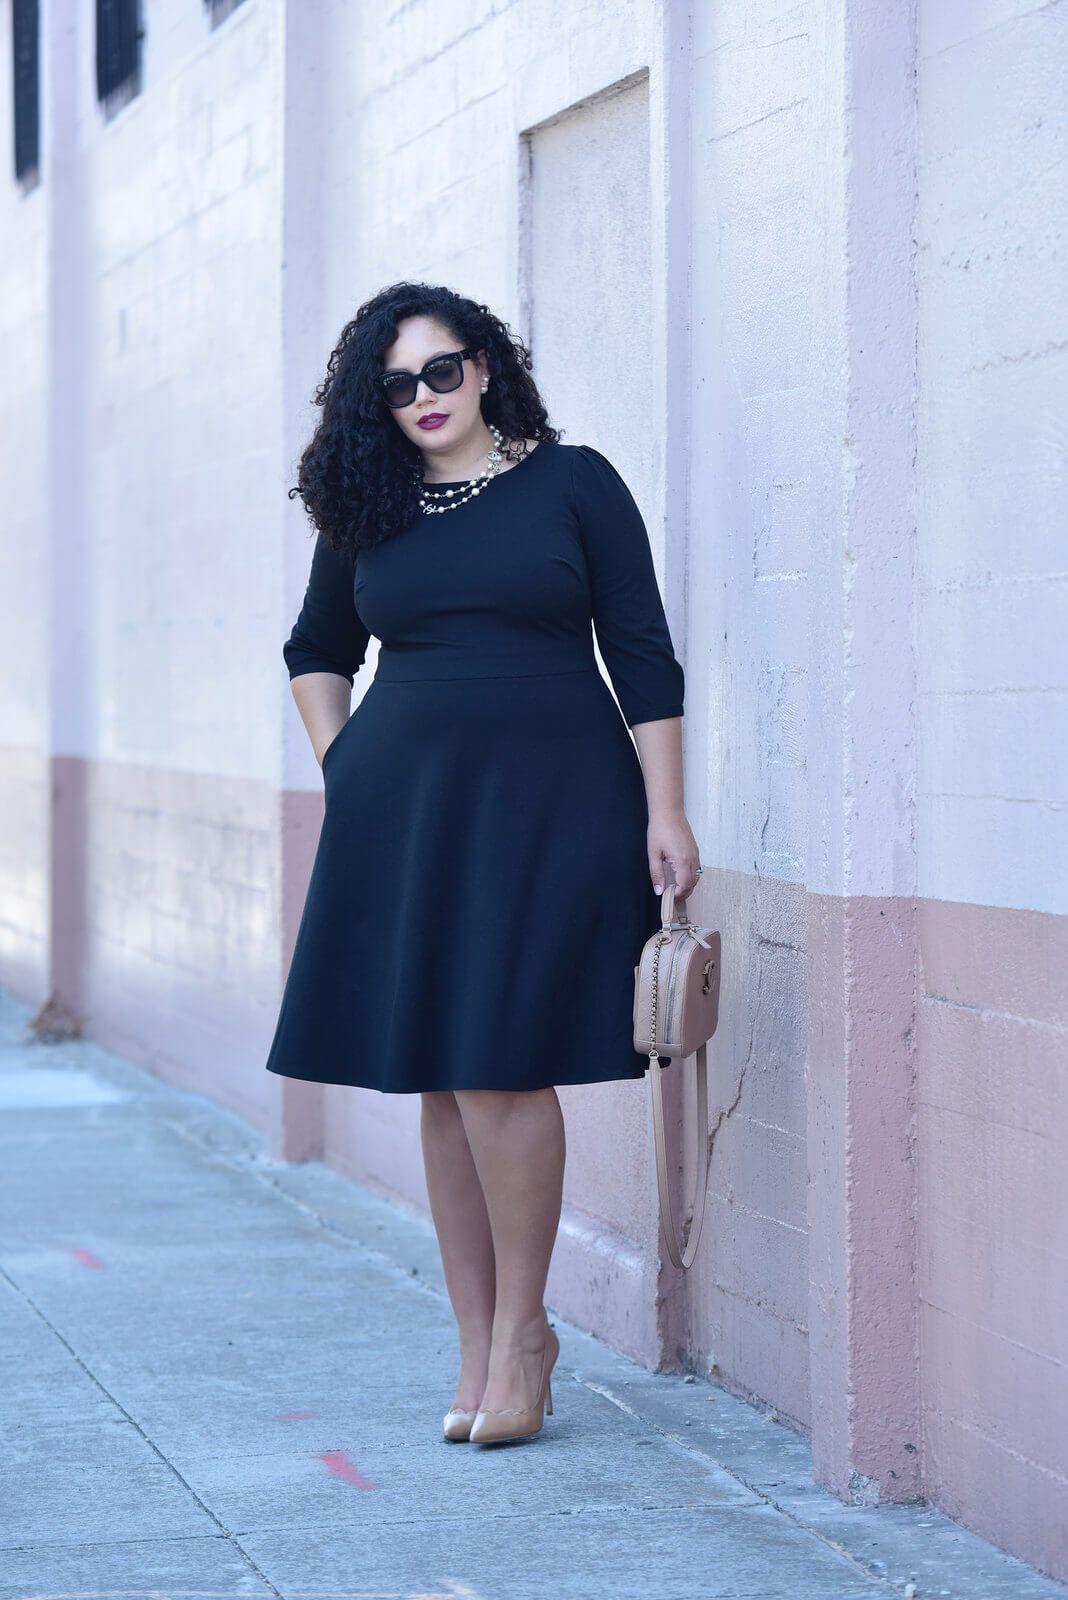 The Little Black Dress Of My Dreams Plus Size Black Dresses Plus Size Dresses Curvy Outfits [ 1600 x 1068 Pixel ]